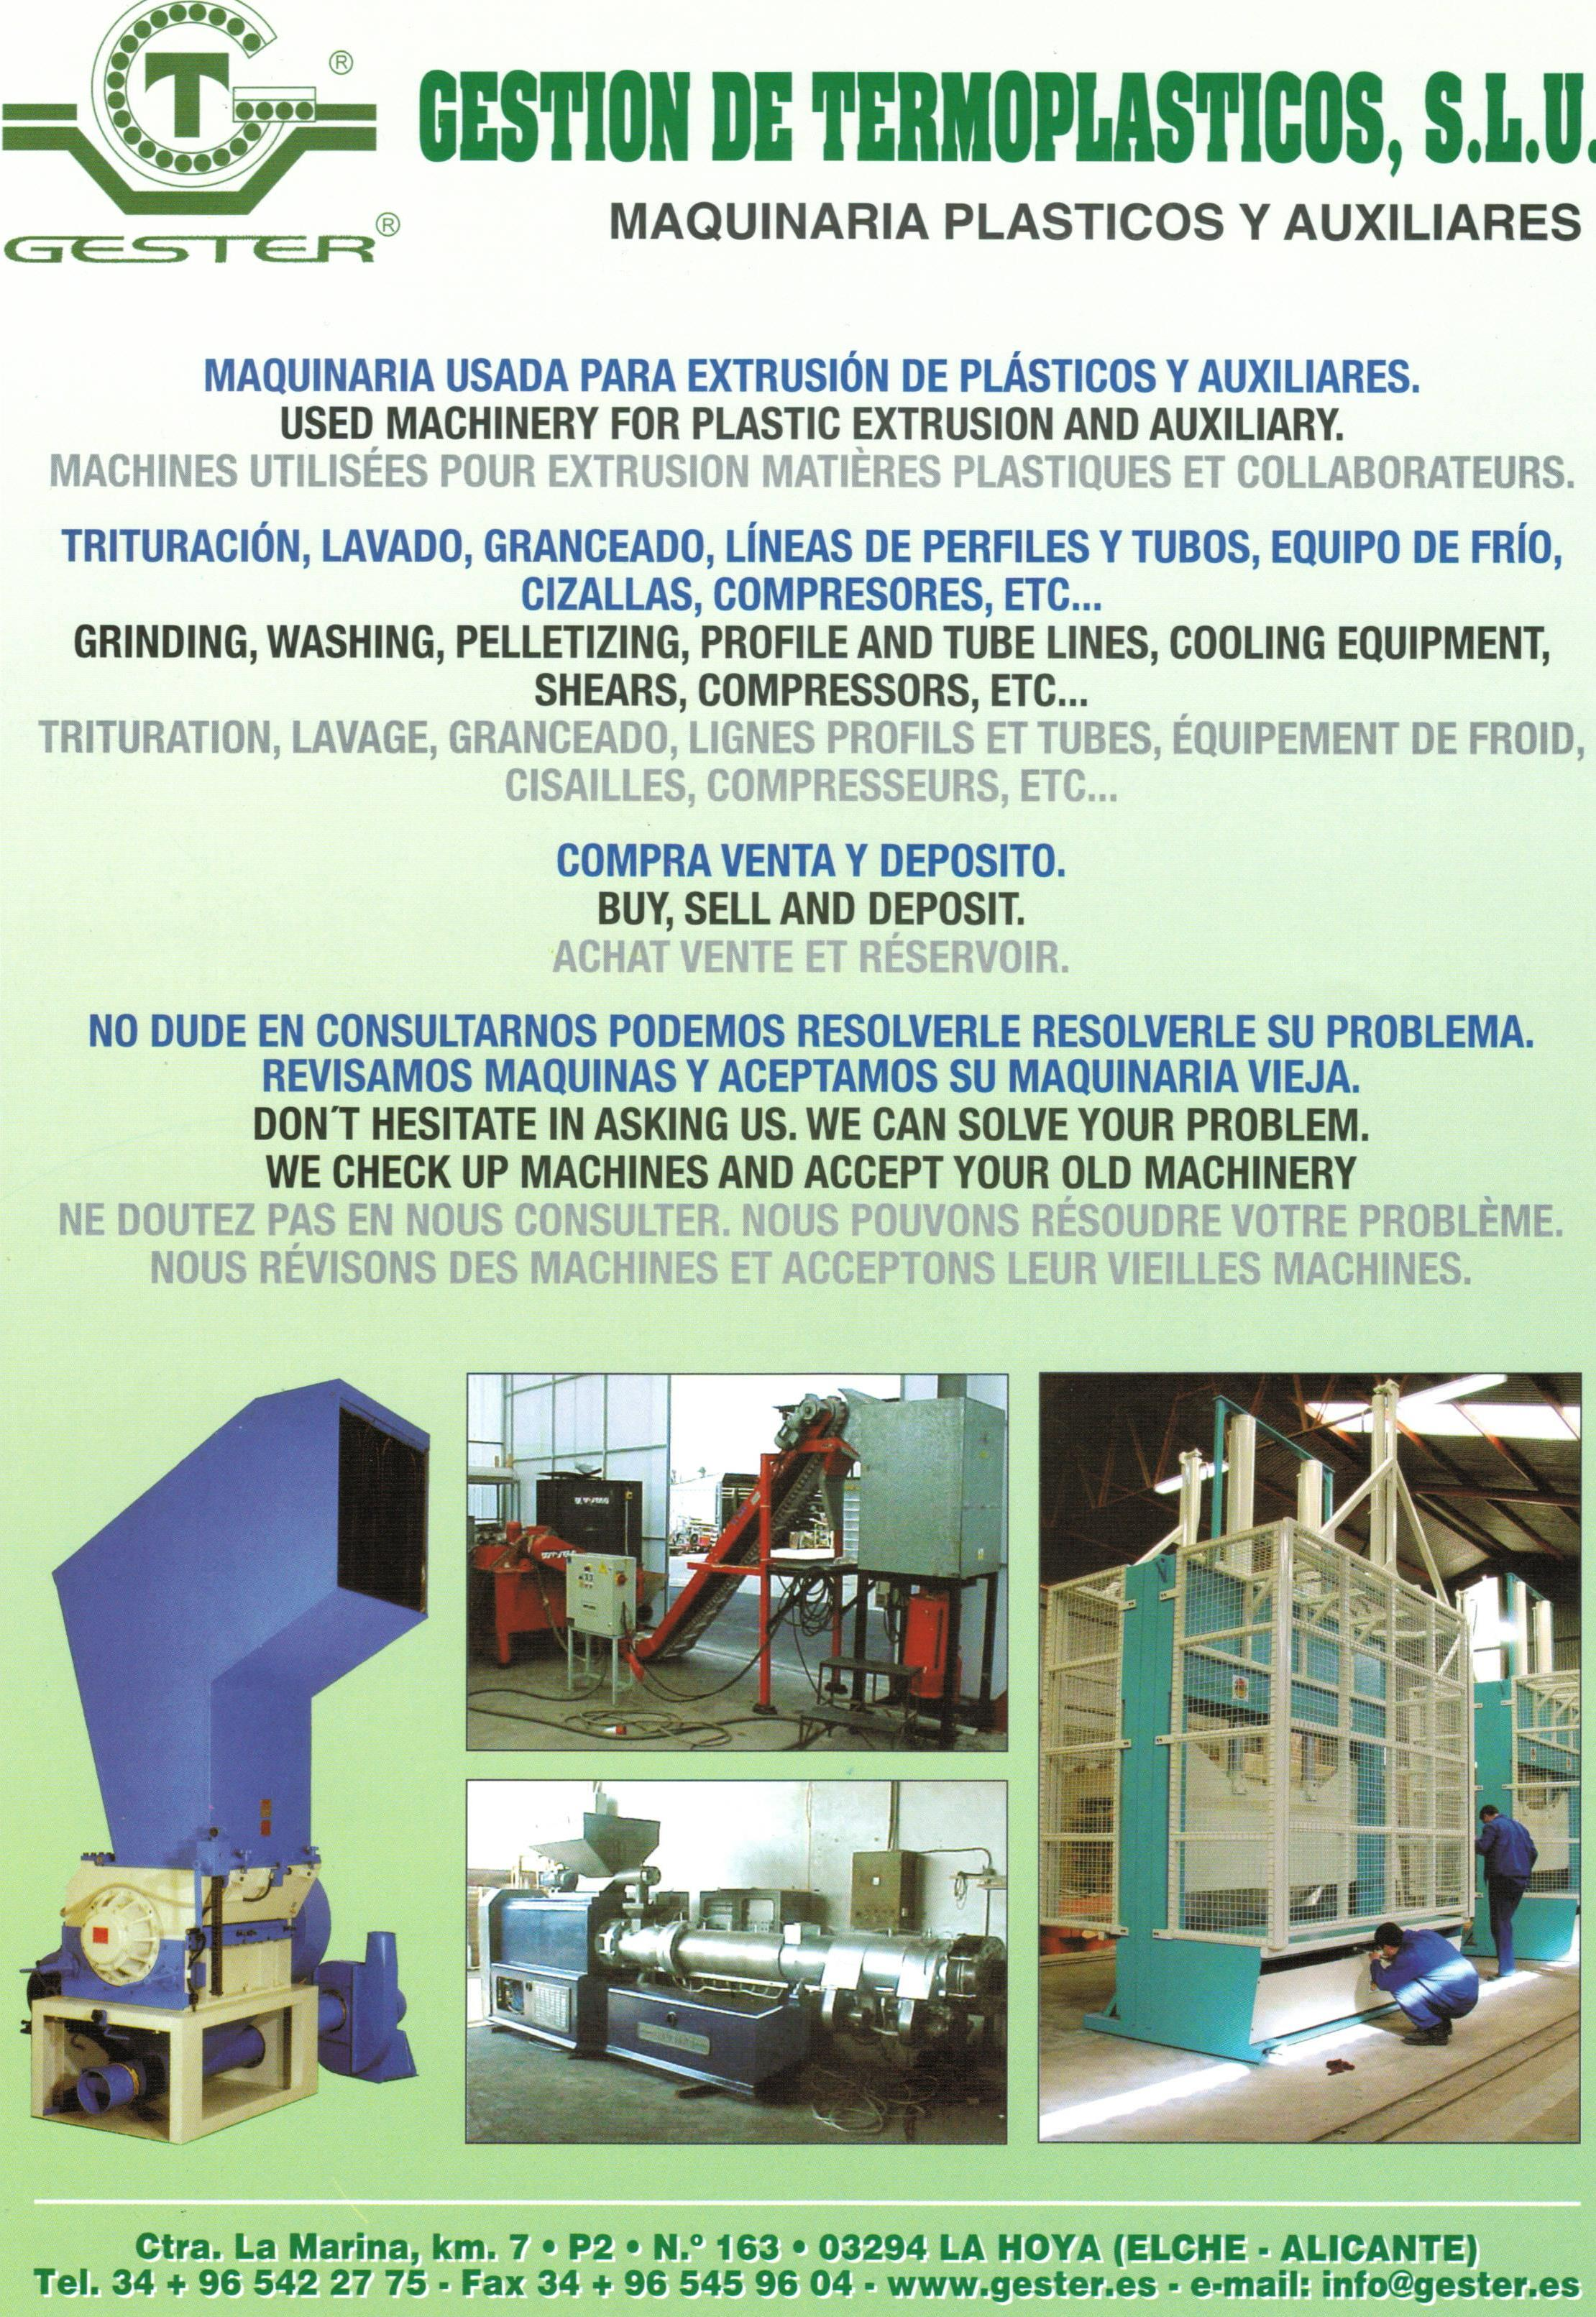 Empresas de mobiliario espa a directorio de empresas for Mobiliario empresas